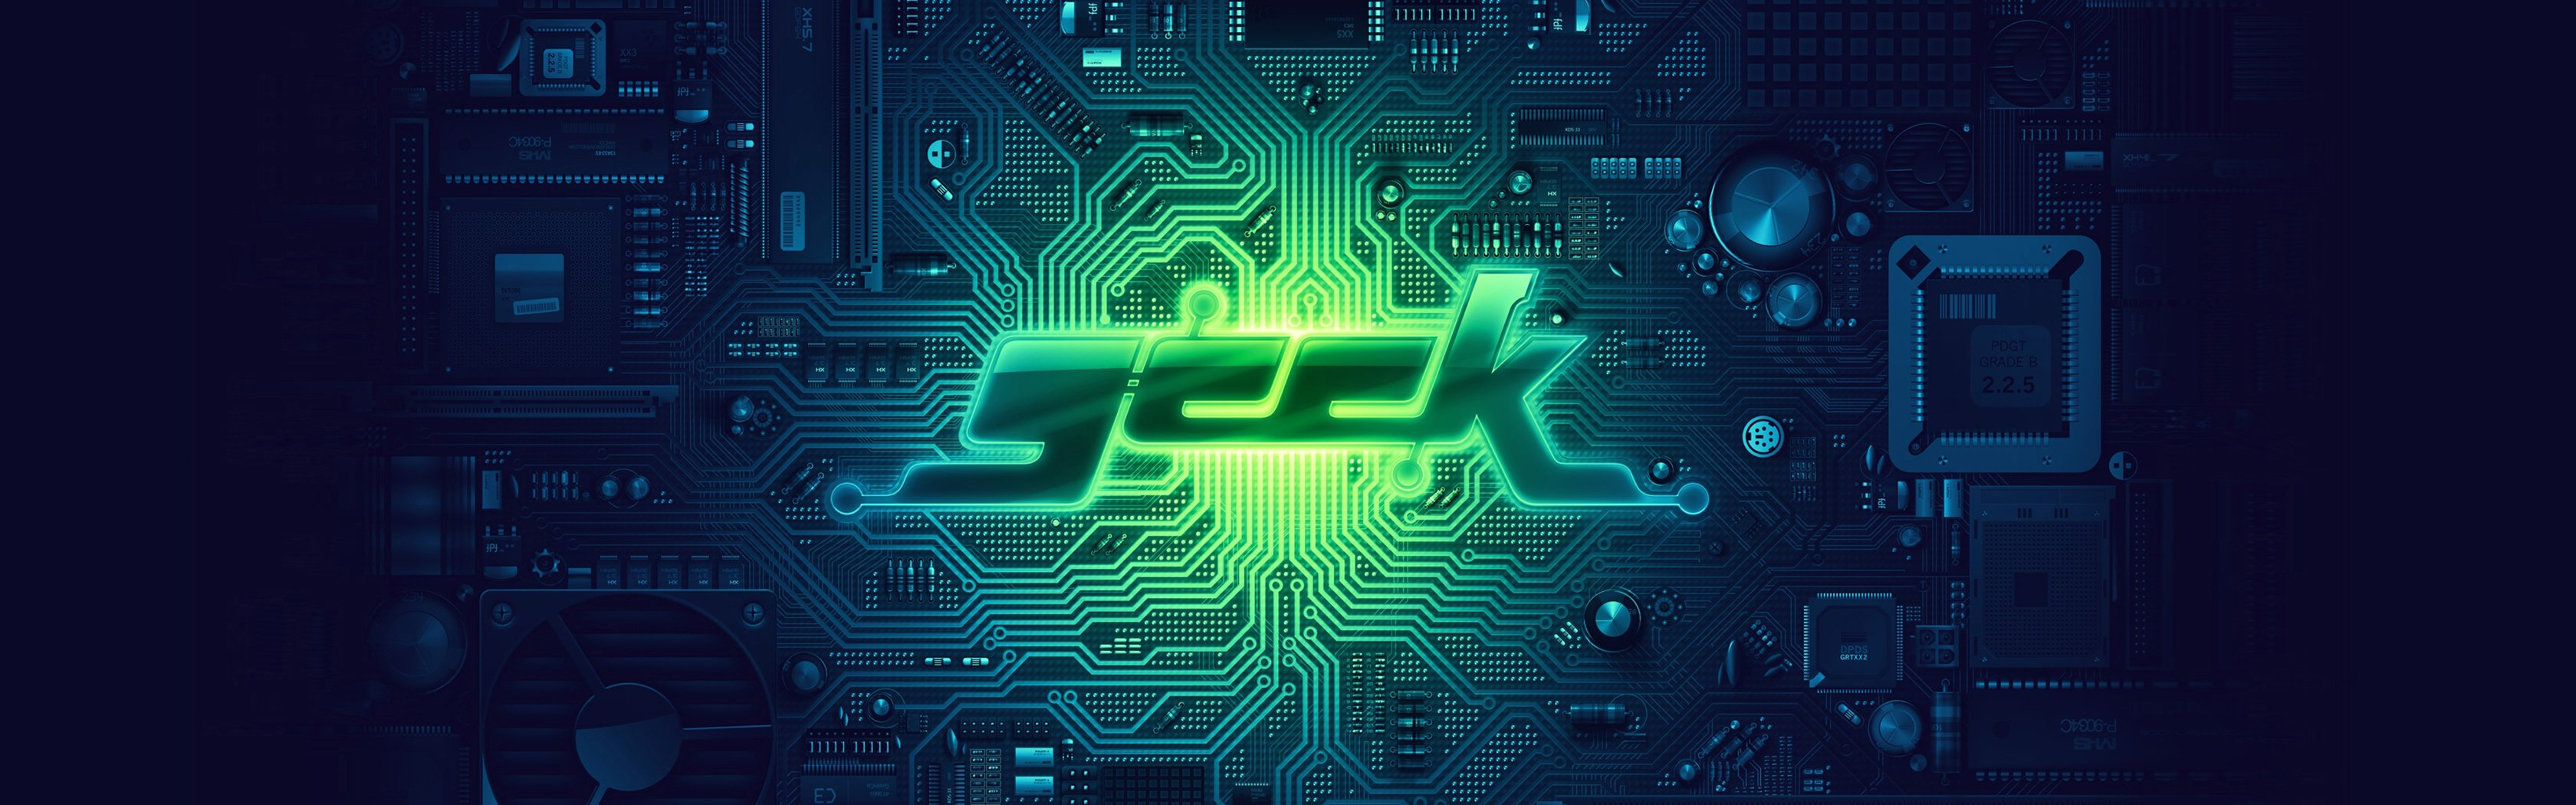 84 Blue Circuit Board Wallpaper Beautiful Green Picture Frame By Robyriker Geek Pcb Motherboards Circuits Derek Prospero